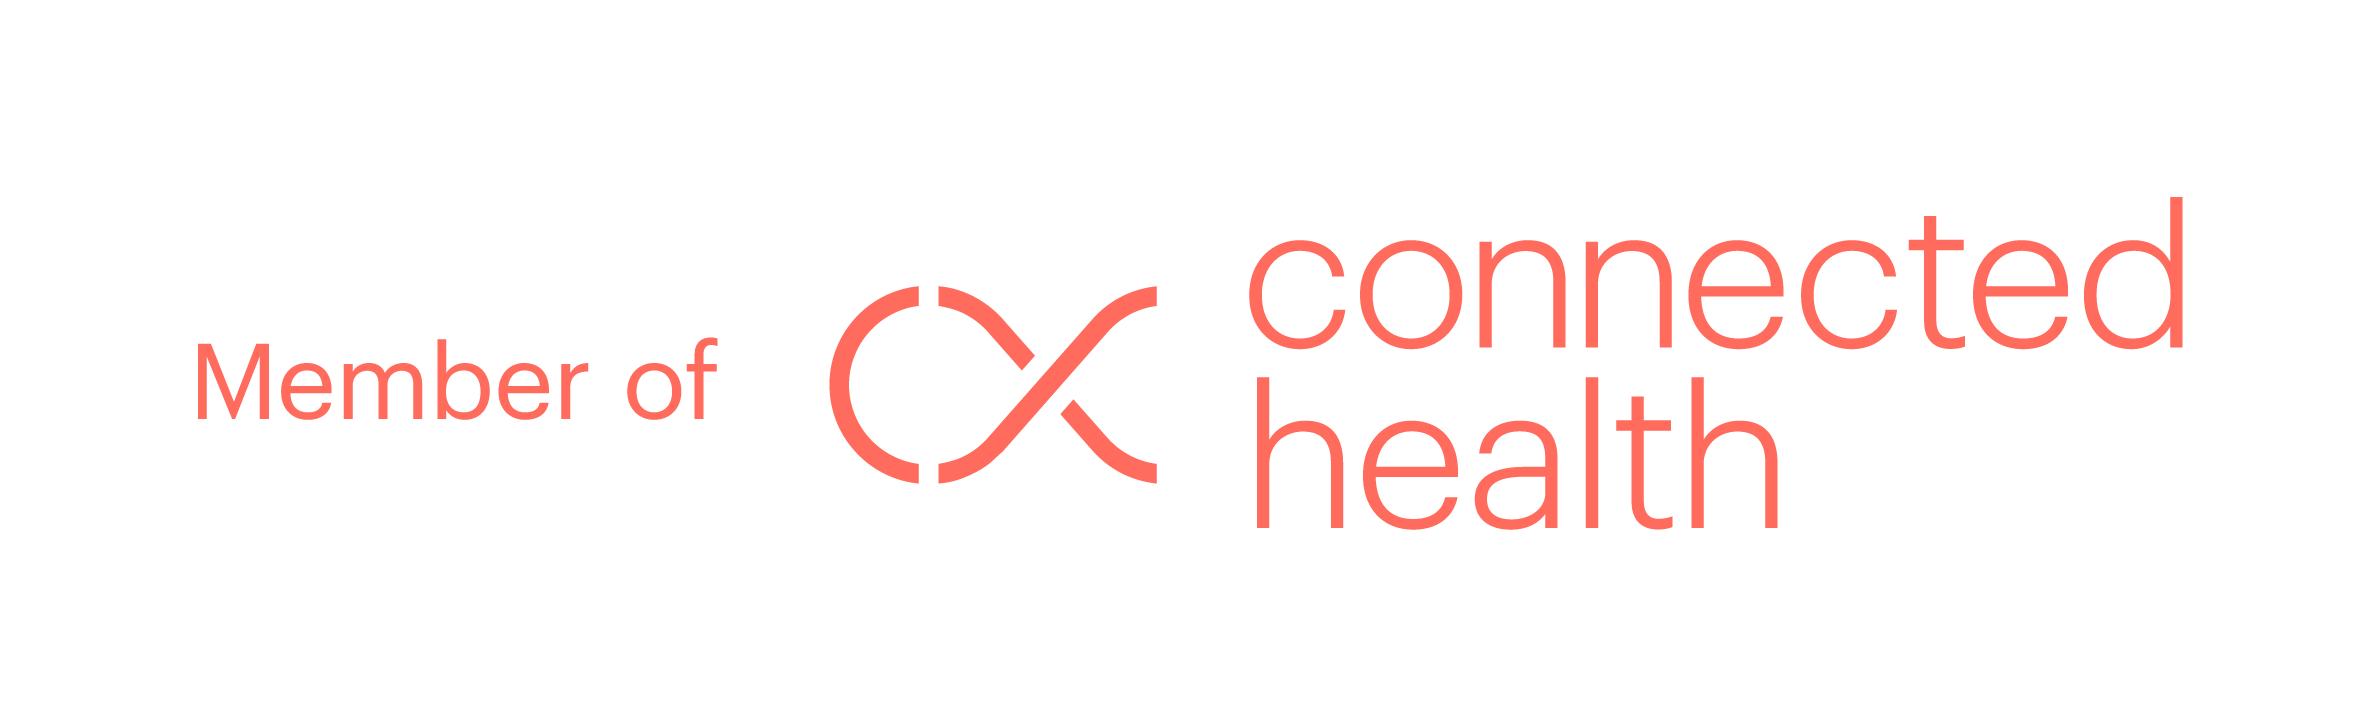 ConnectedHealth_member_logo